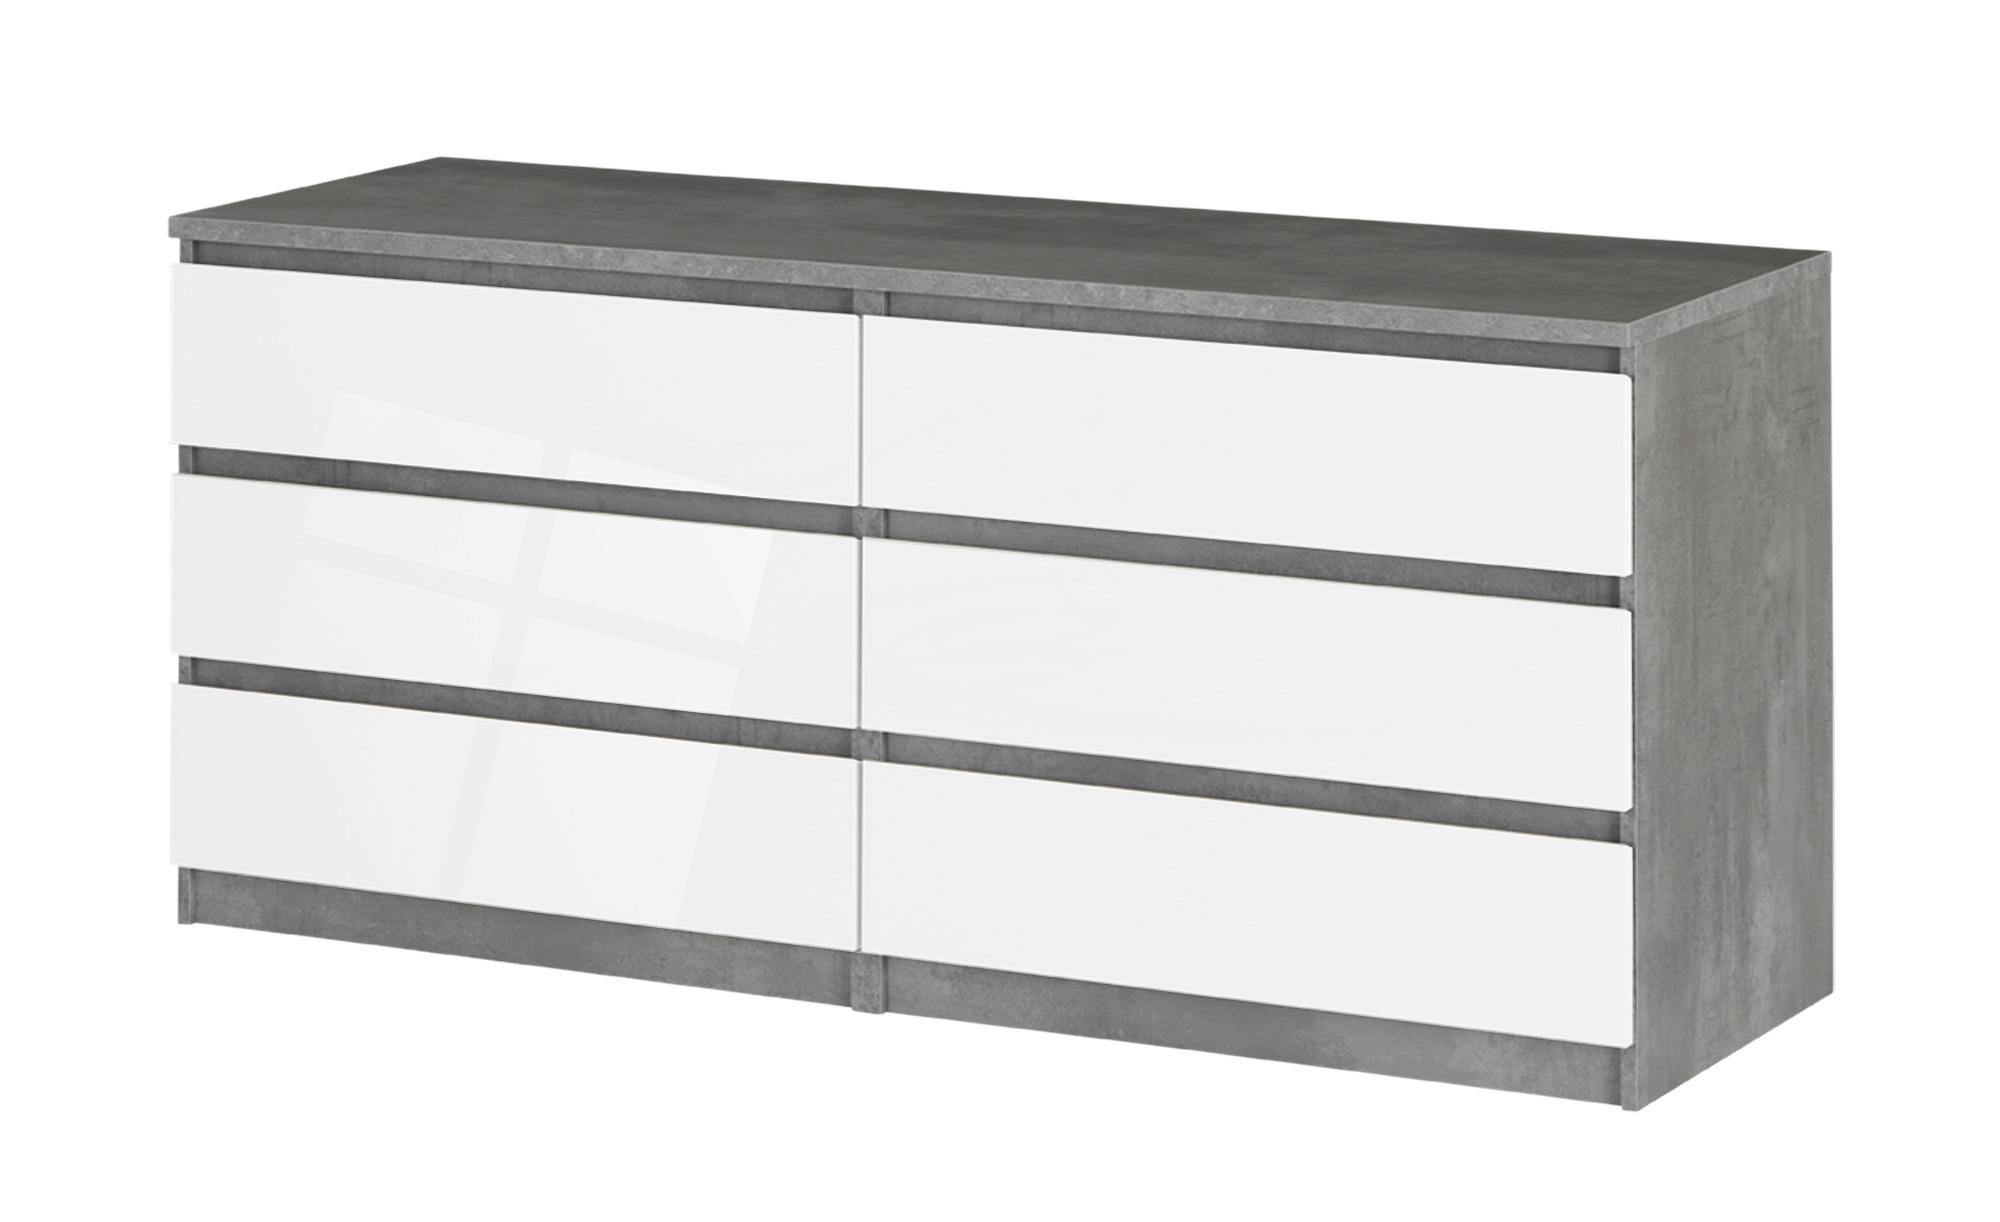 Sideboard mit 6 Schüben  Nardo ¦ grau ¦ Maße (cm): B: 153,8 H: 70,1 T: 50 Kommoden & Sideboards > Kommoden - Höffner